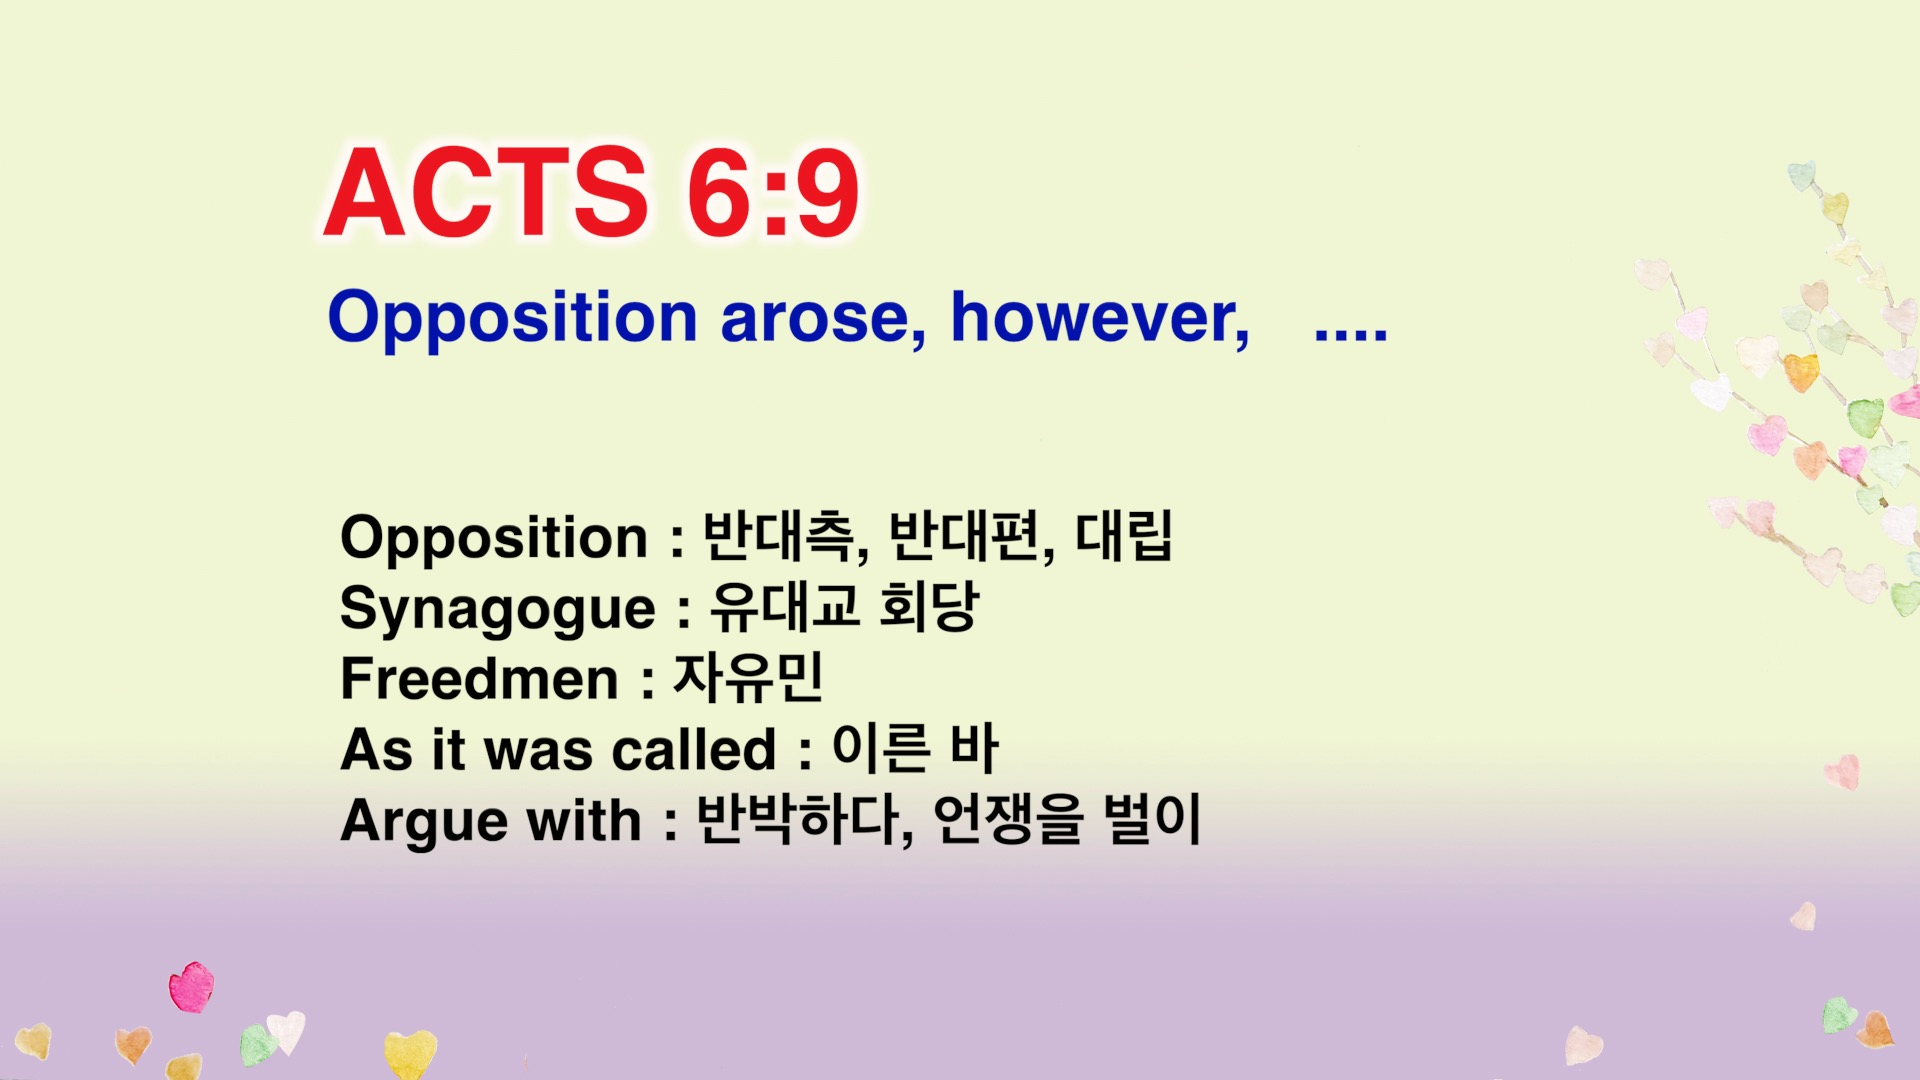 Leena's Bible English-Acts Chap. 6, Ver.9